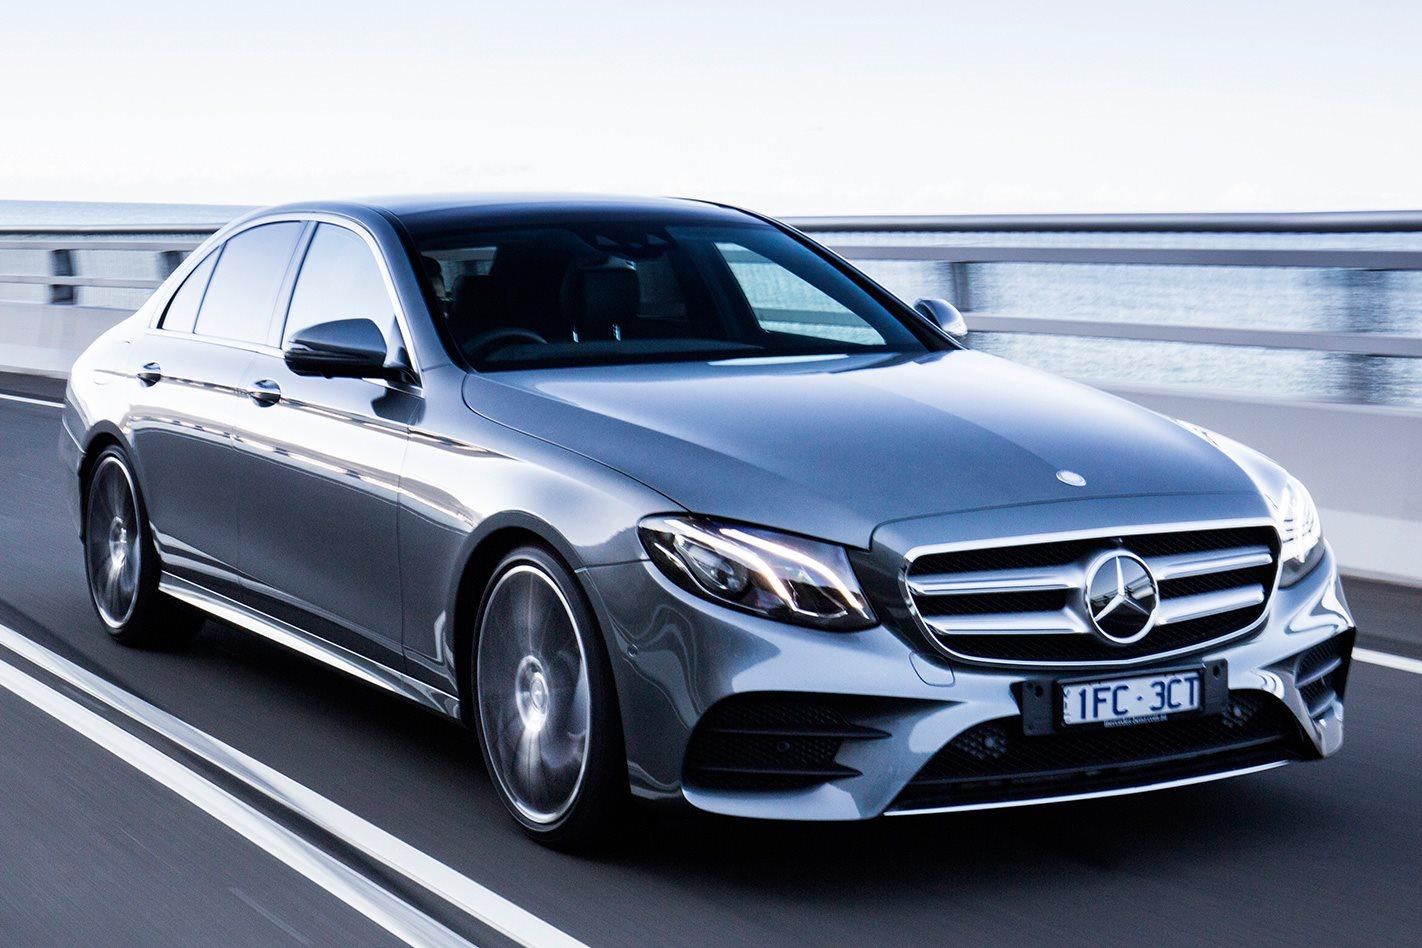 Mercedes Benz E Class Pricing Confirmed